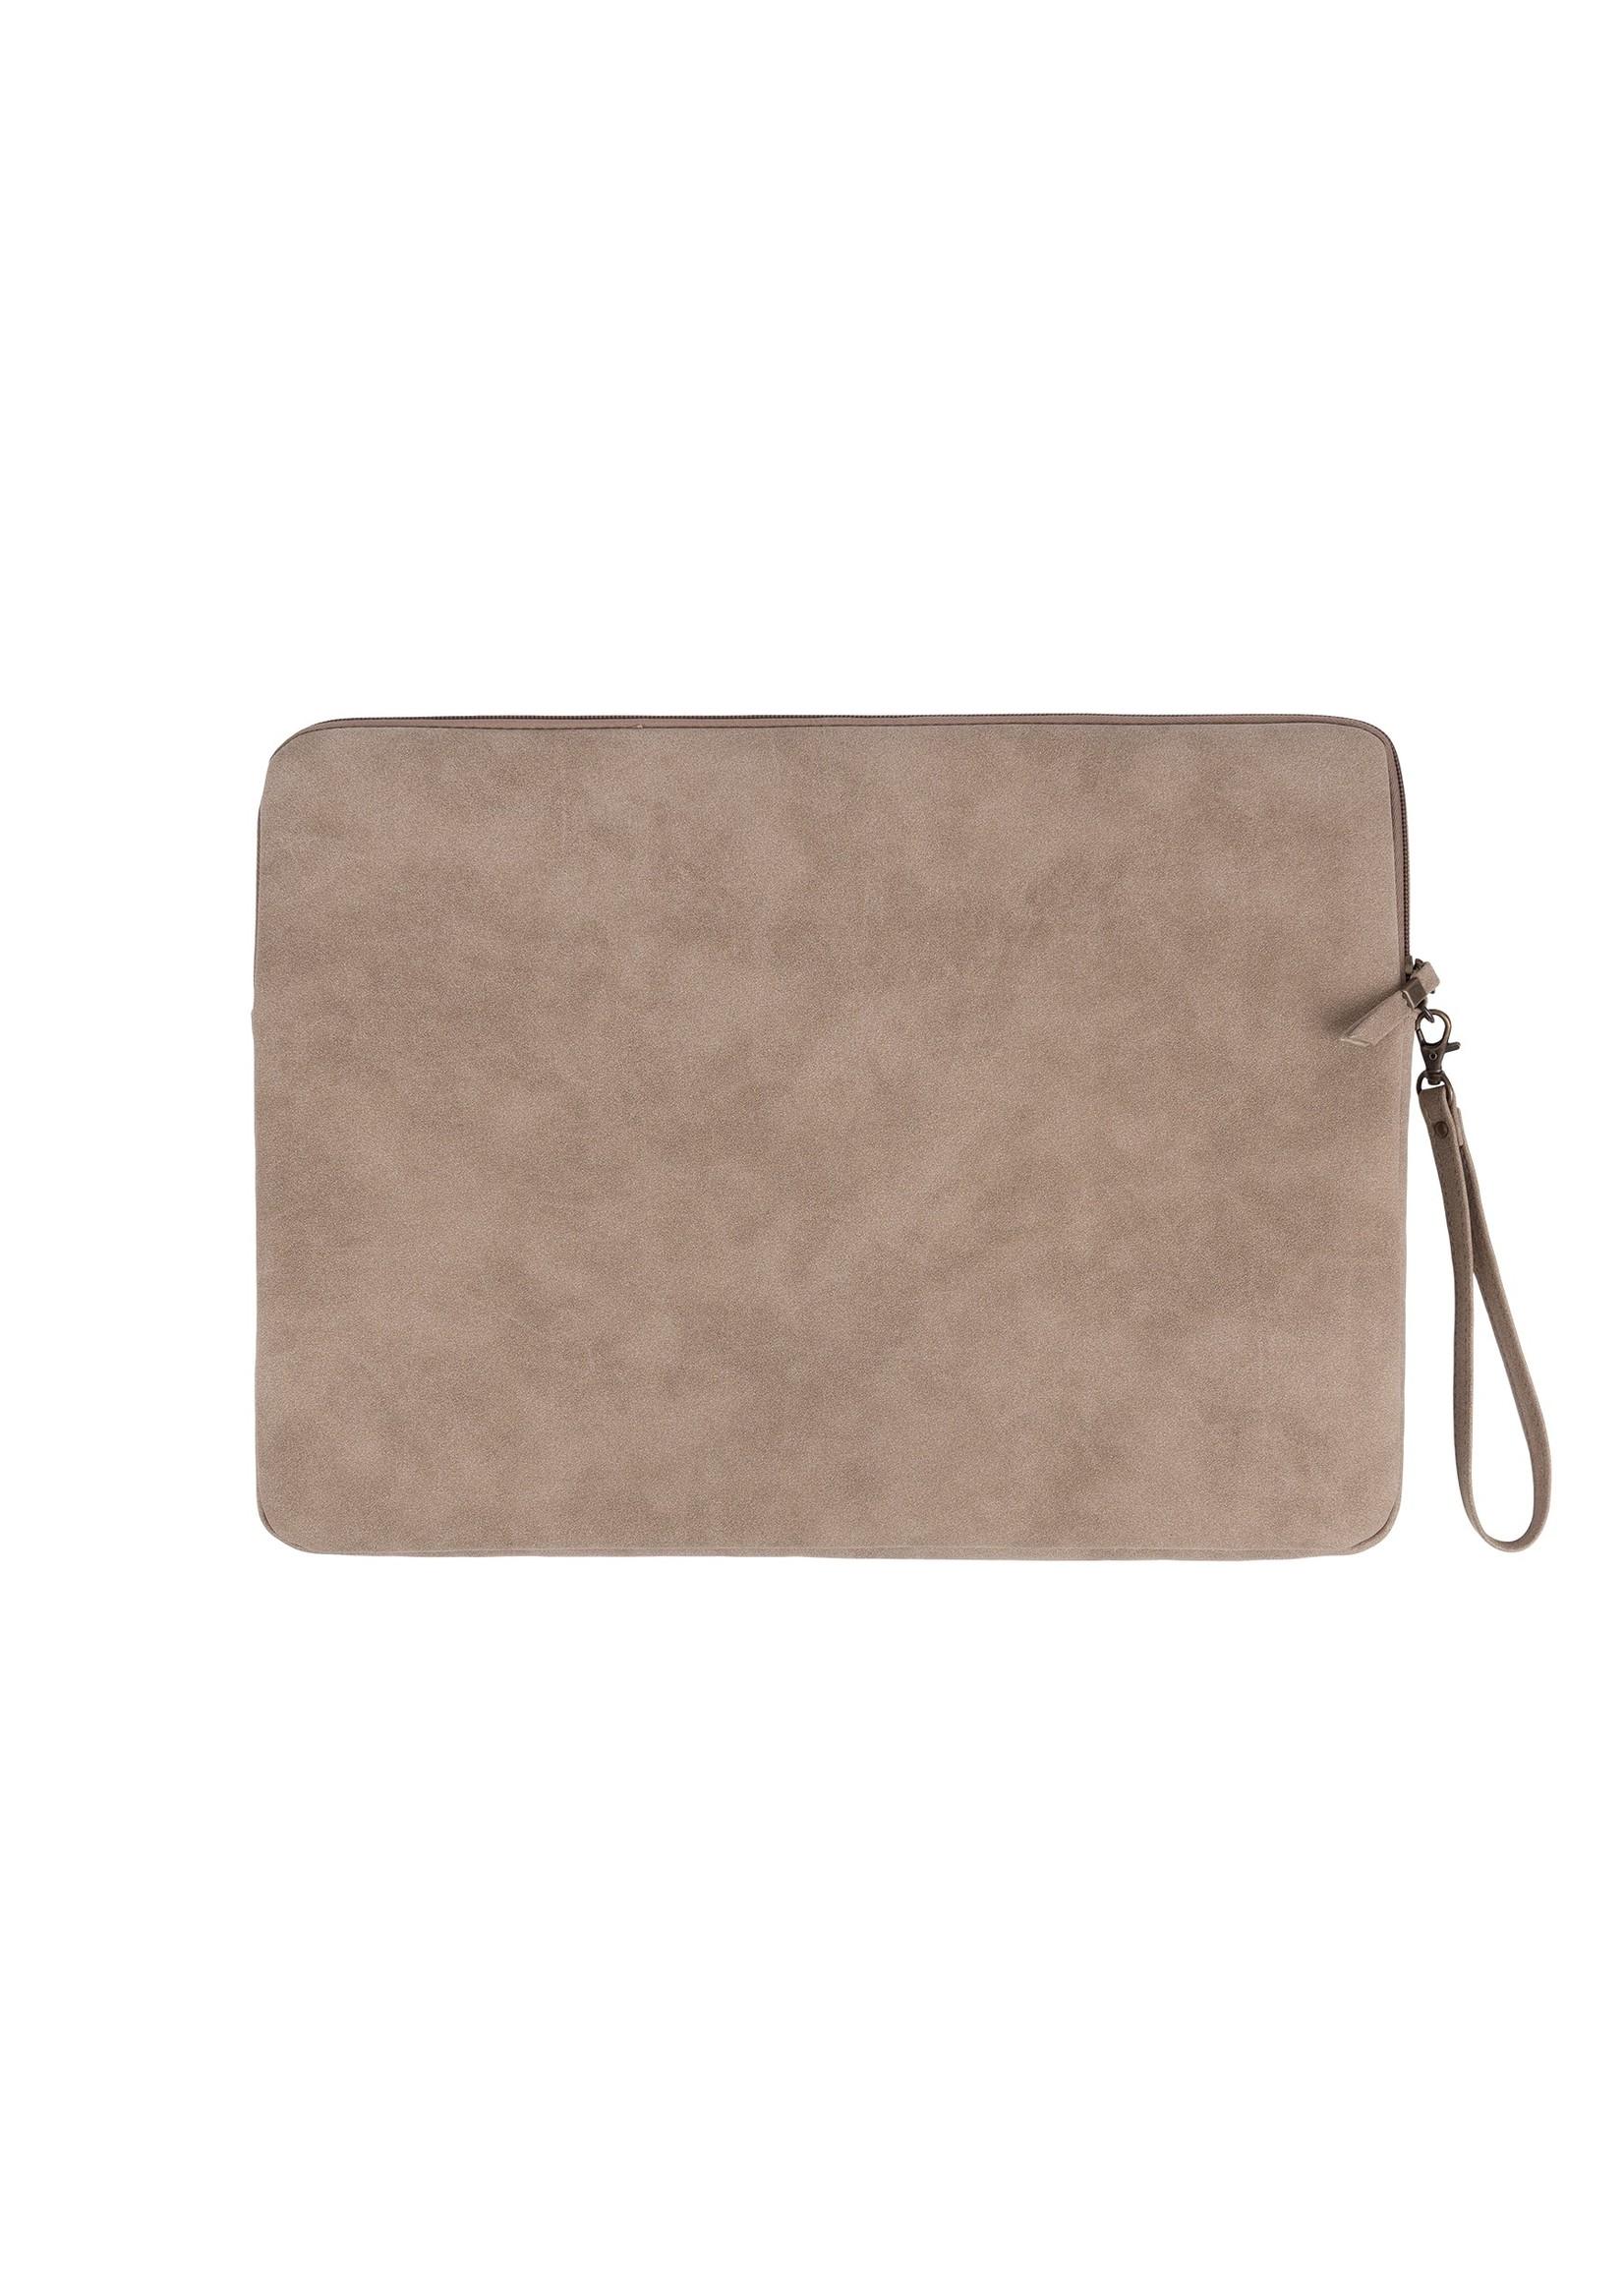 ZUSSS laptopcover zand 17 inch